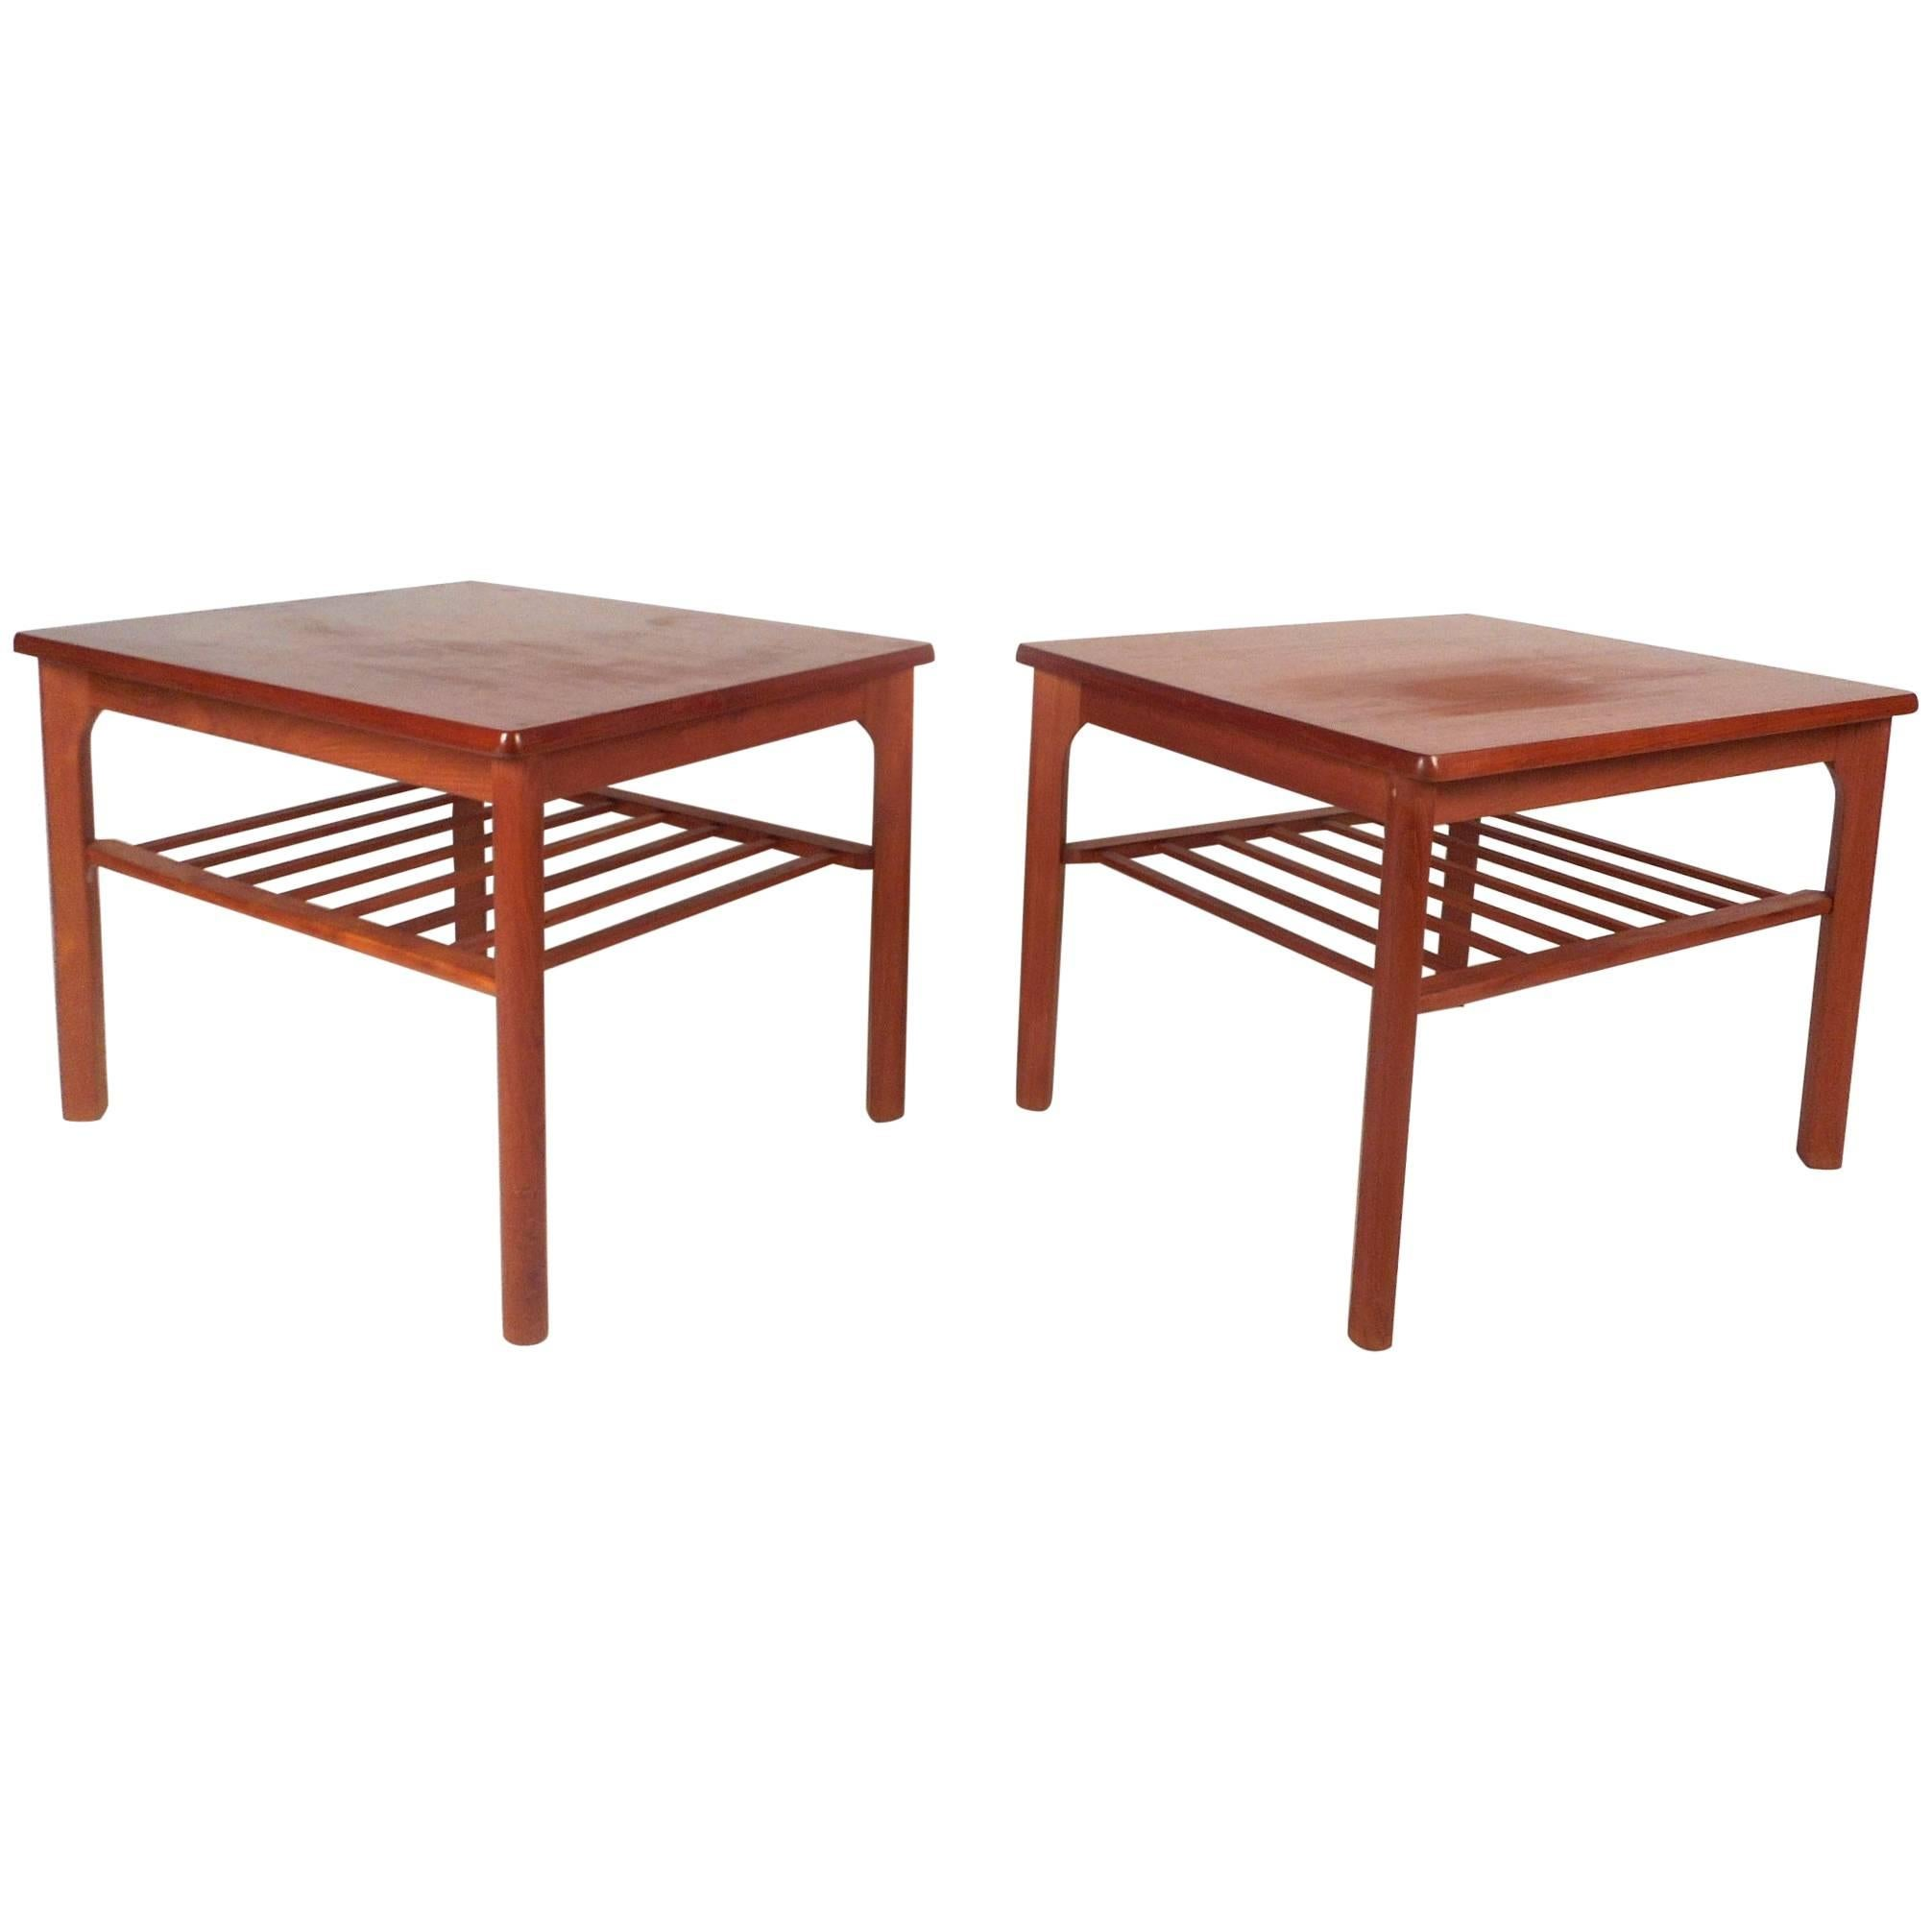 Pair of Mid-Century Modern Danish Teak End Tables by Mobelfabrikken Toften